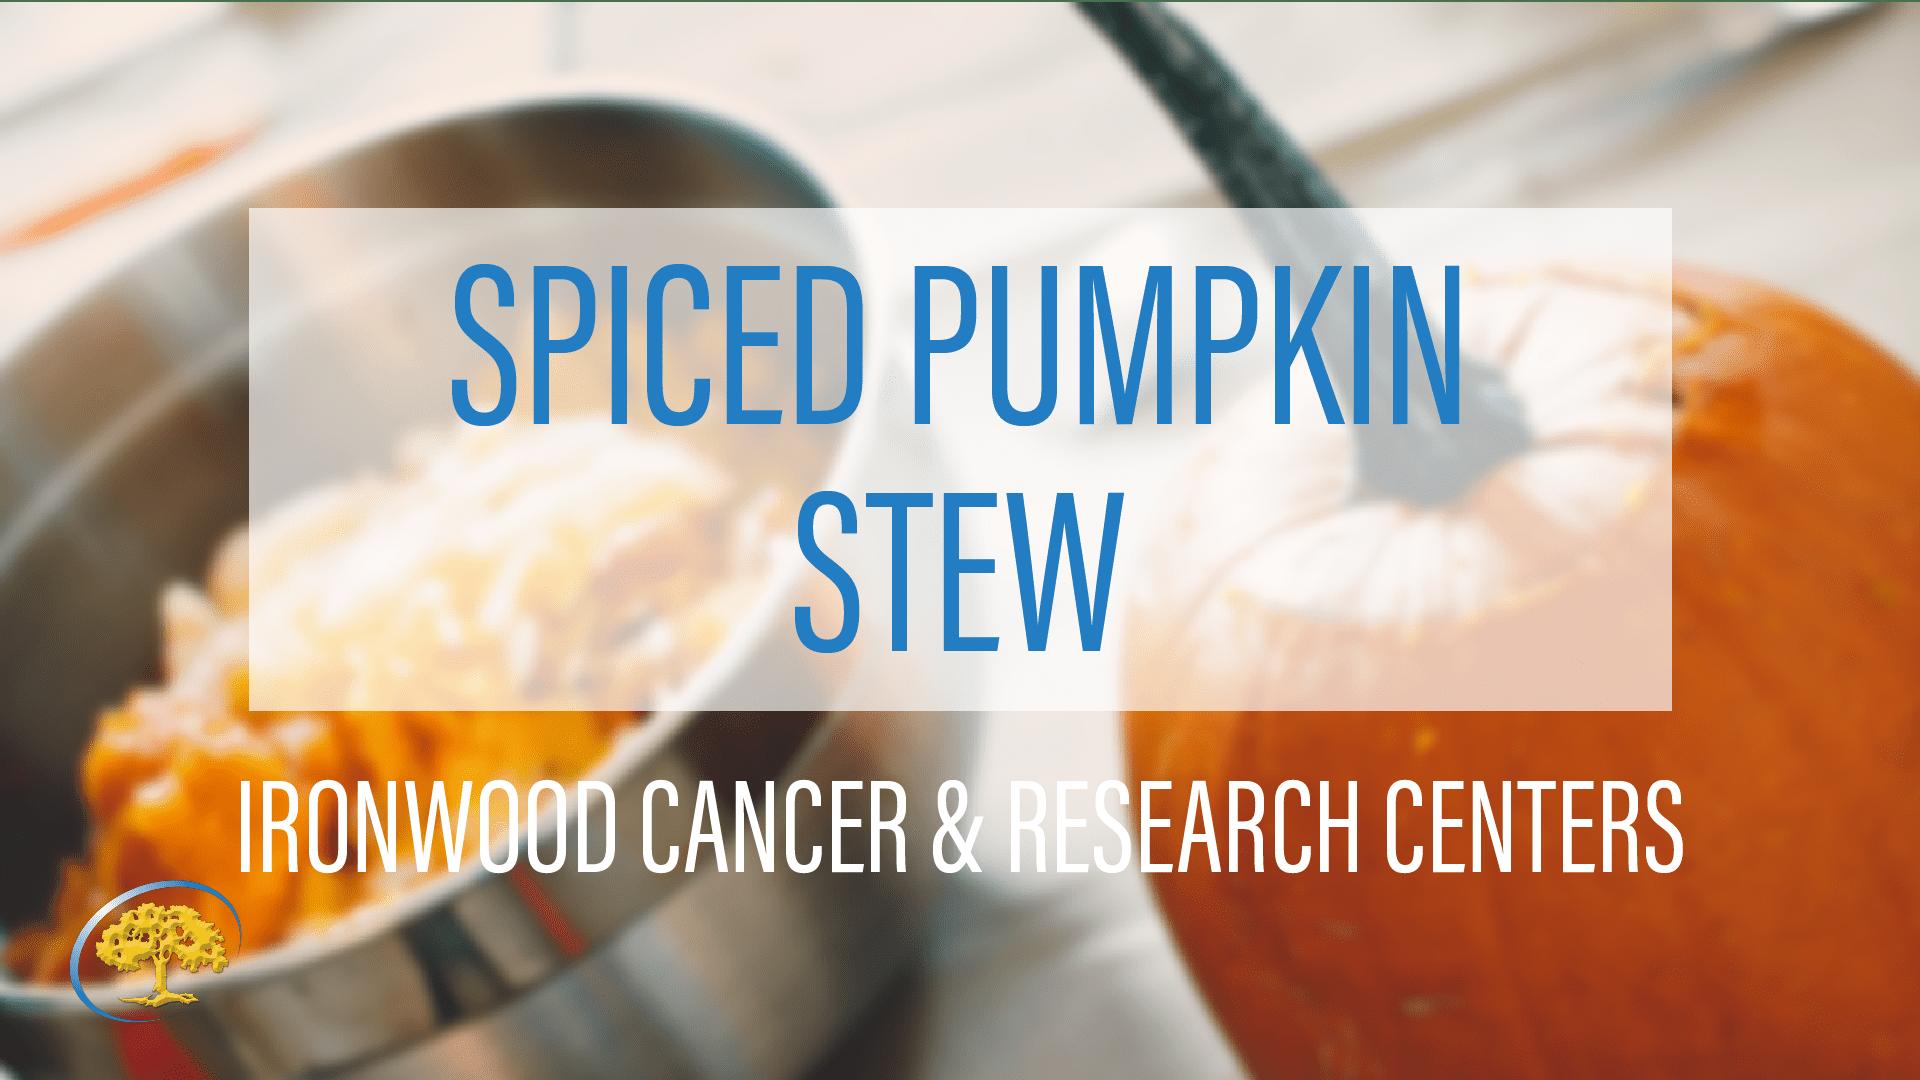 Spiced Pumpkin Stew Ironwood Cancer & Research Centers